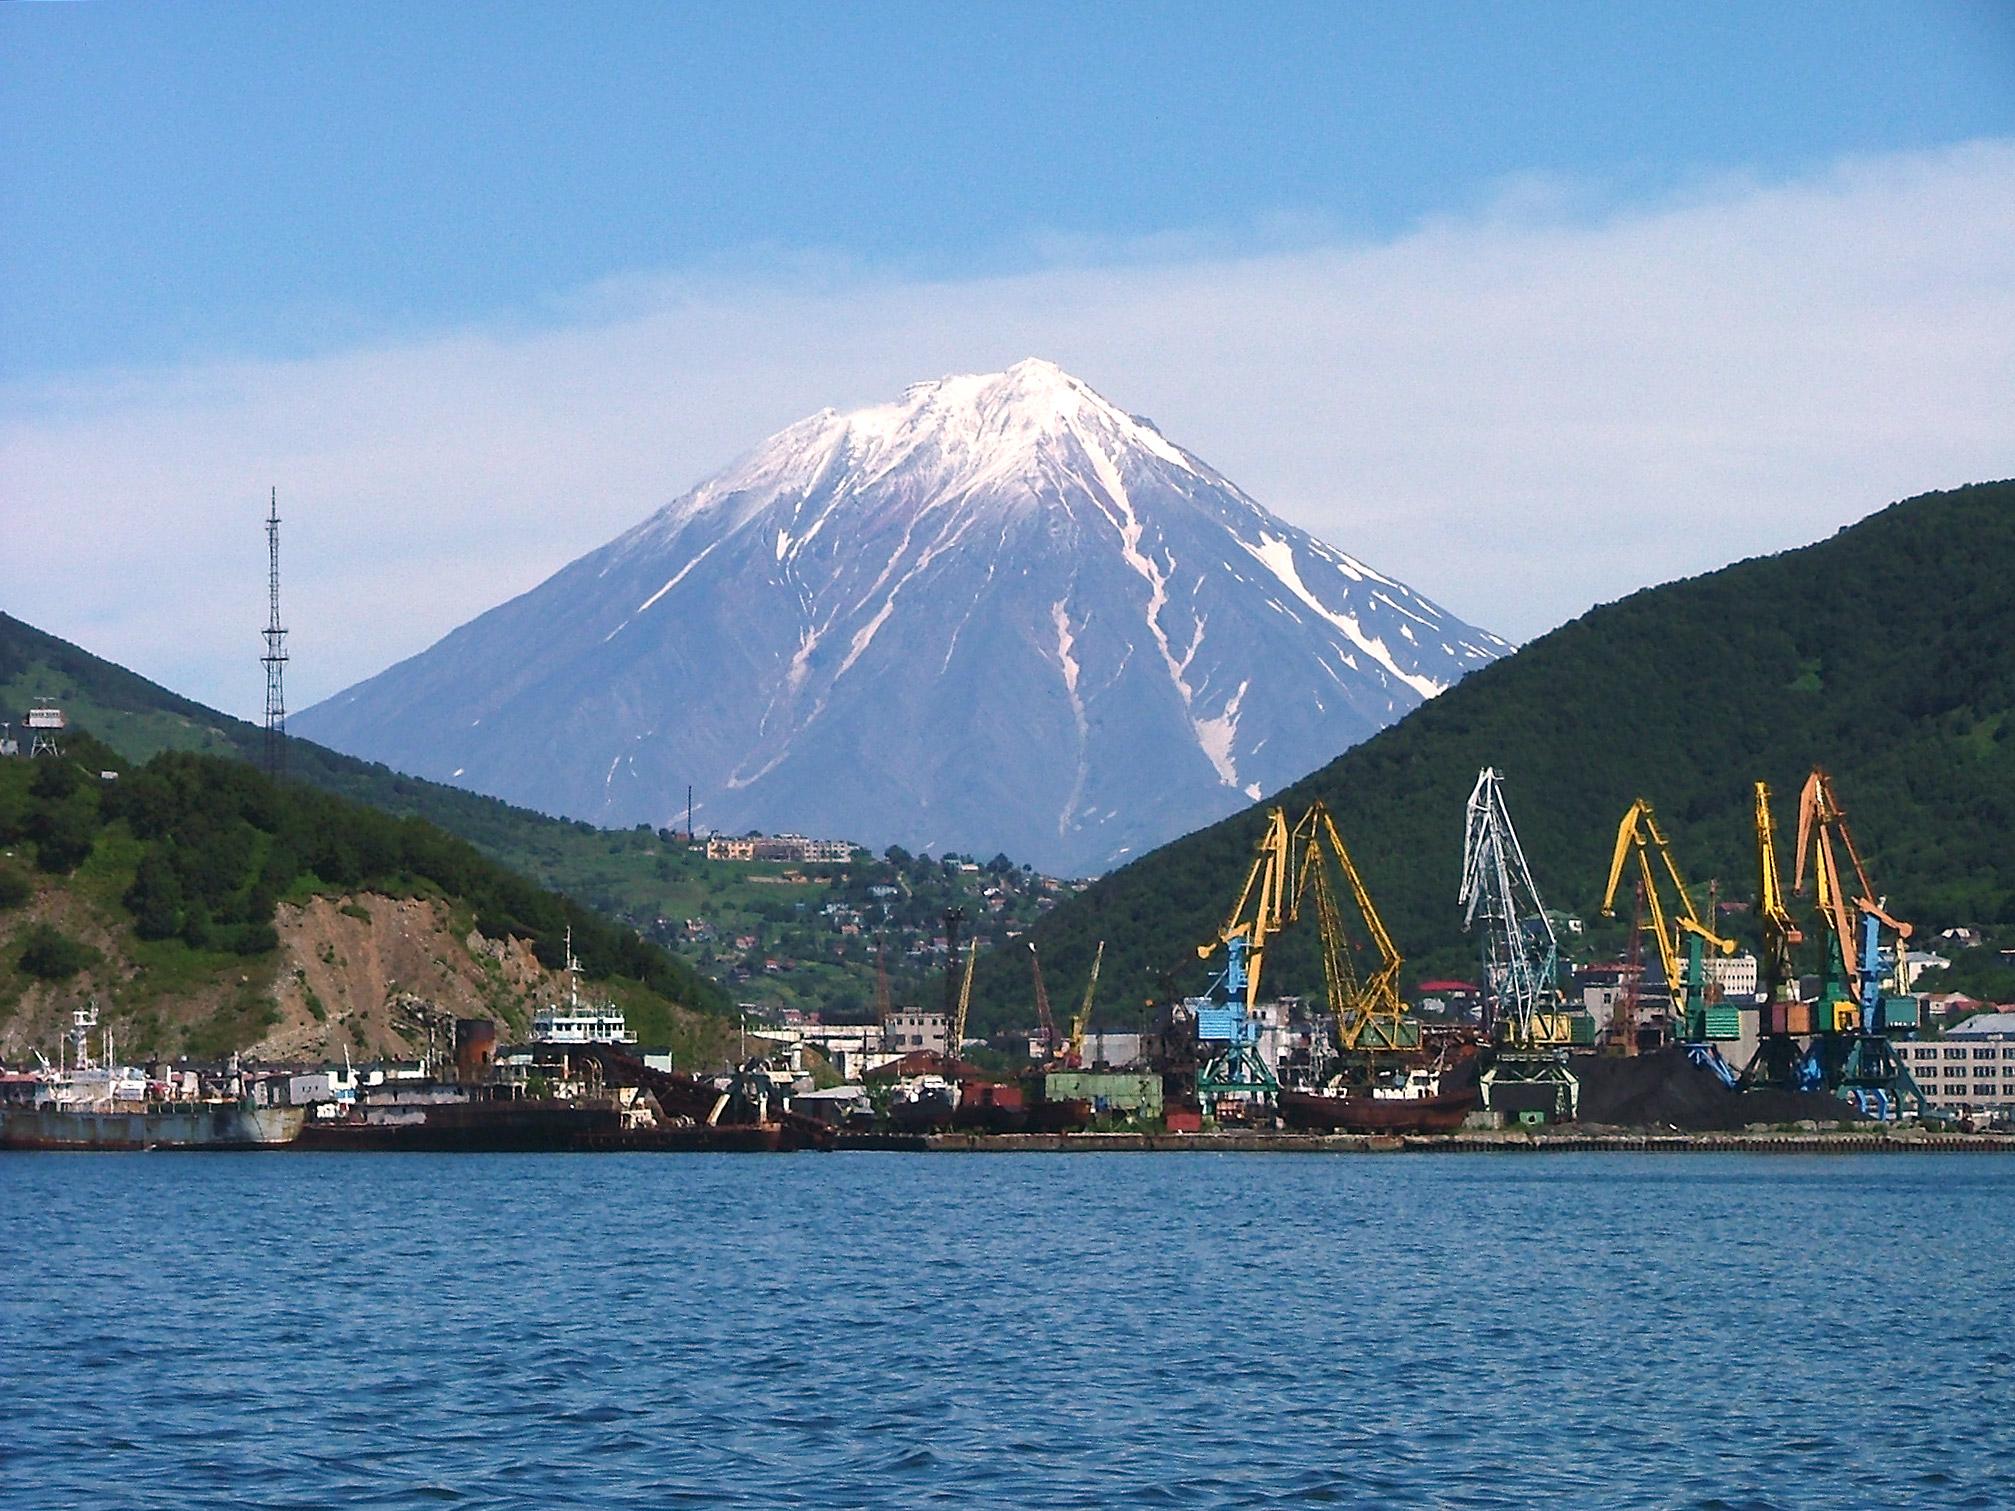 Les putes de Petropavlovsk Kamchatka